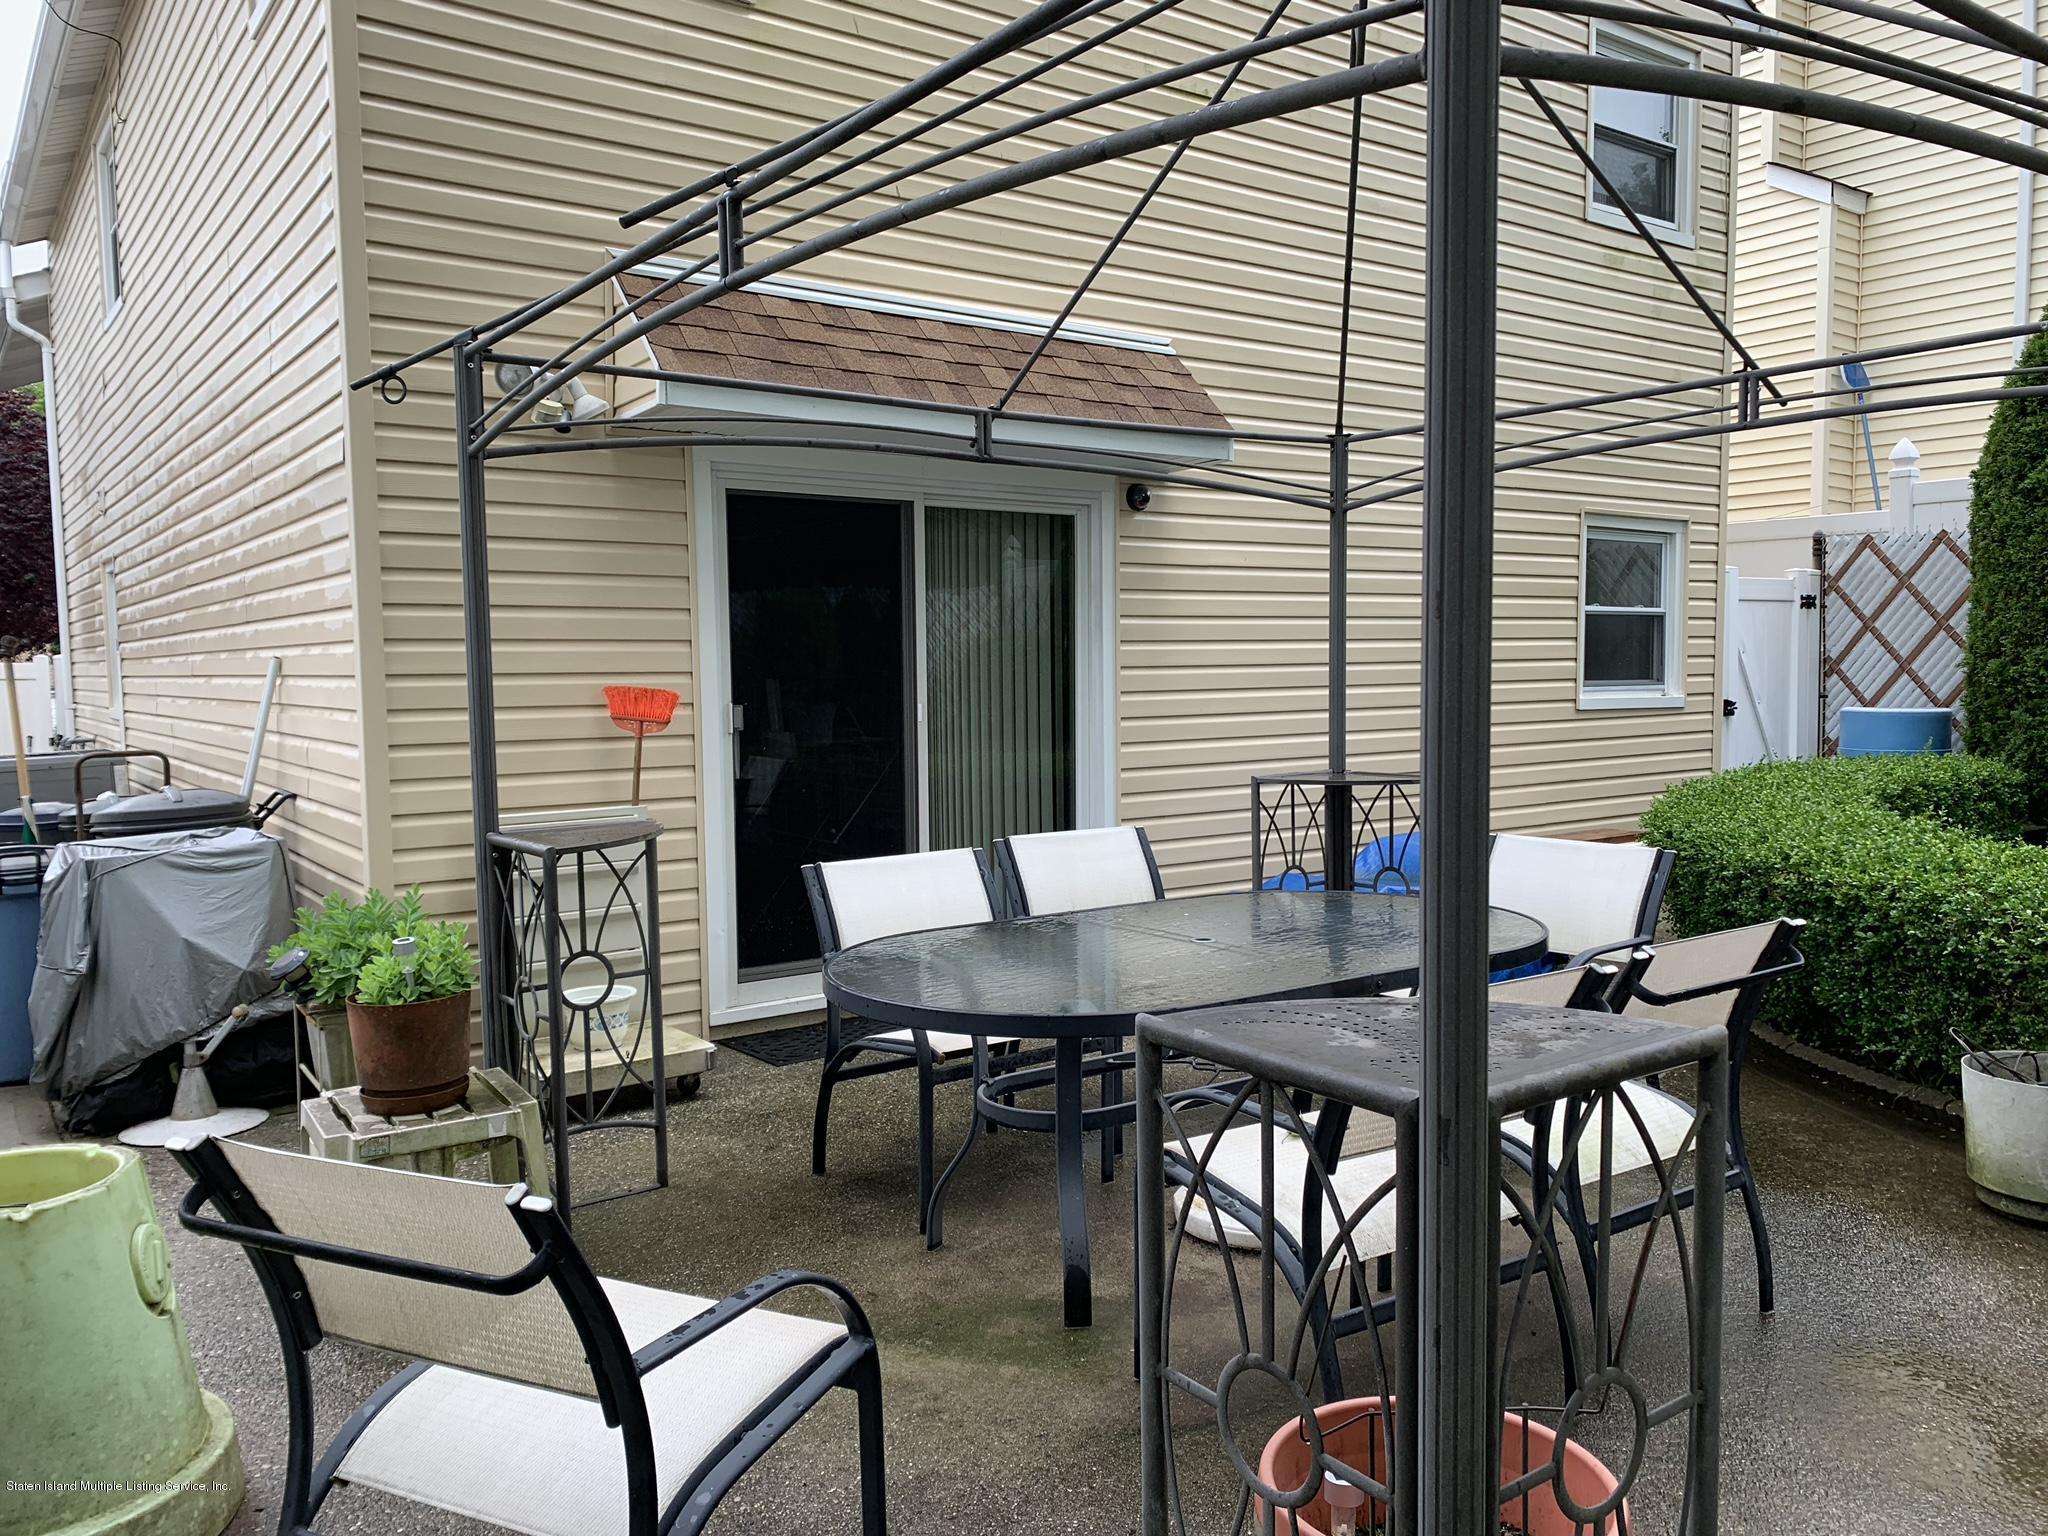 Single Family - Detached 283 Holdridge Avenue  Staten Island, NY 10312, MLS-1130000-28